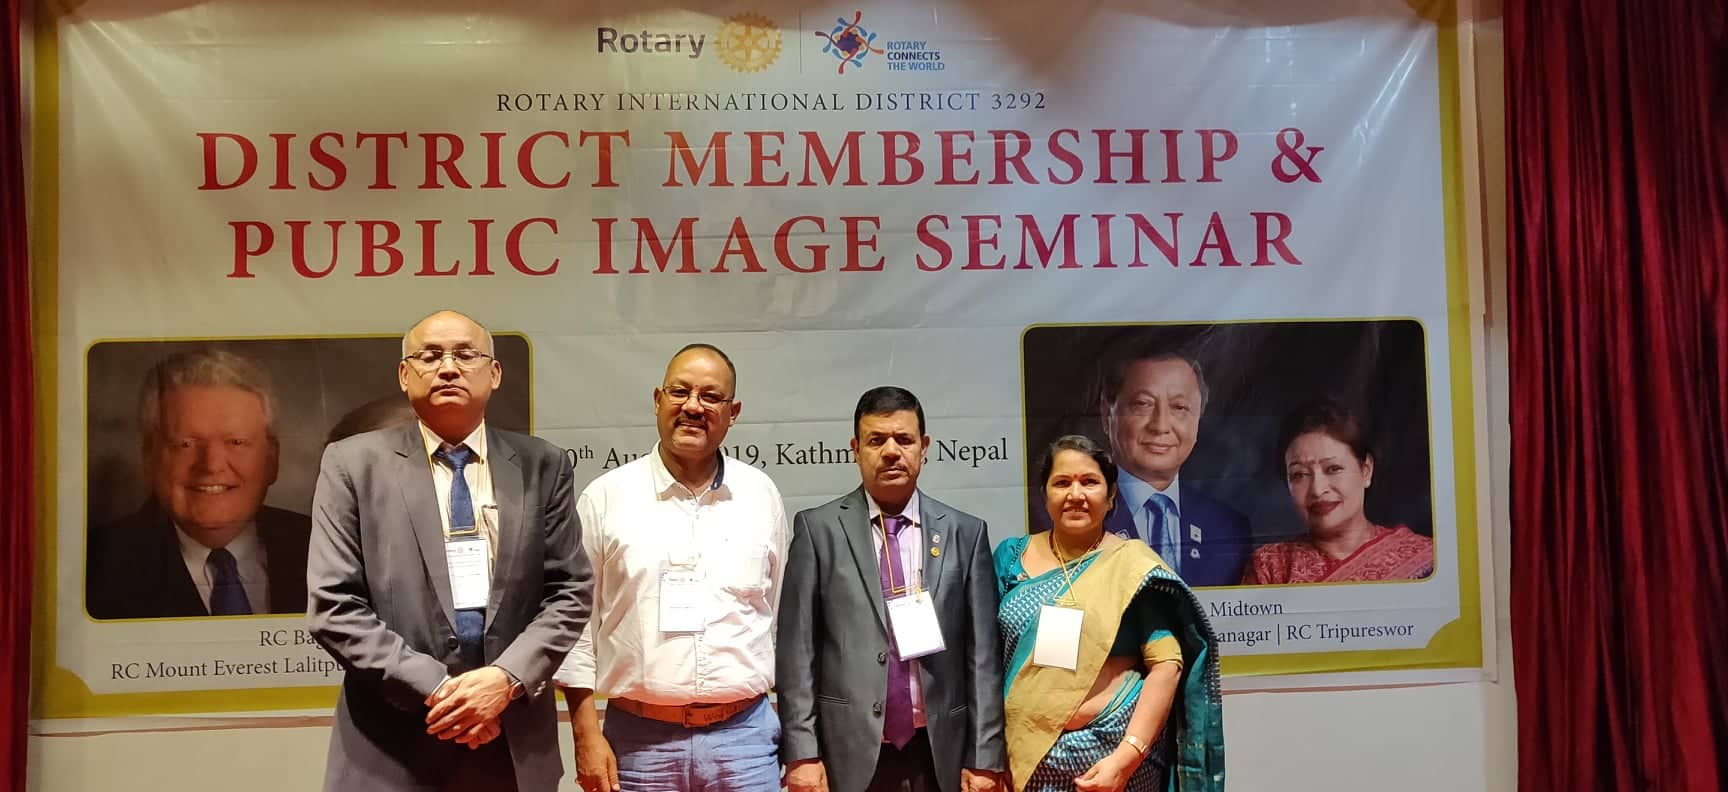 Attended-District-Membership-Public-Image-Seminar-2019-Rotary-Club-of-Kakarvitta-1